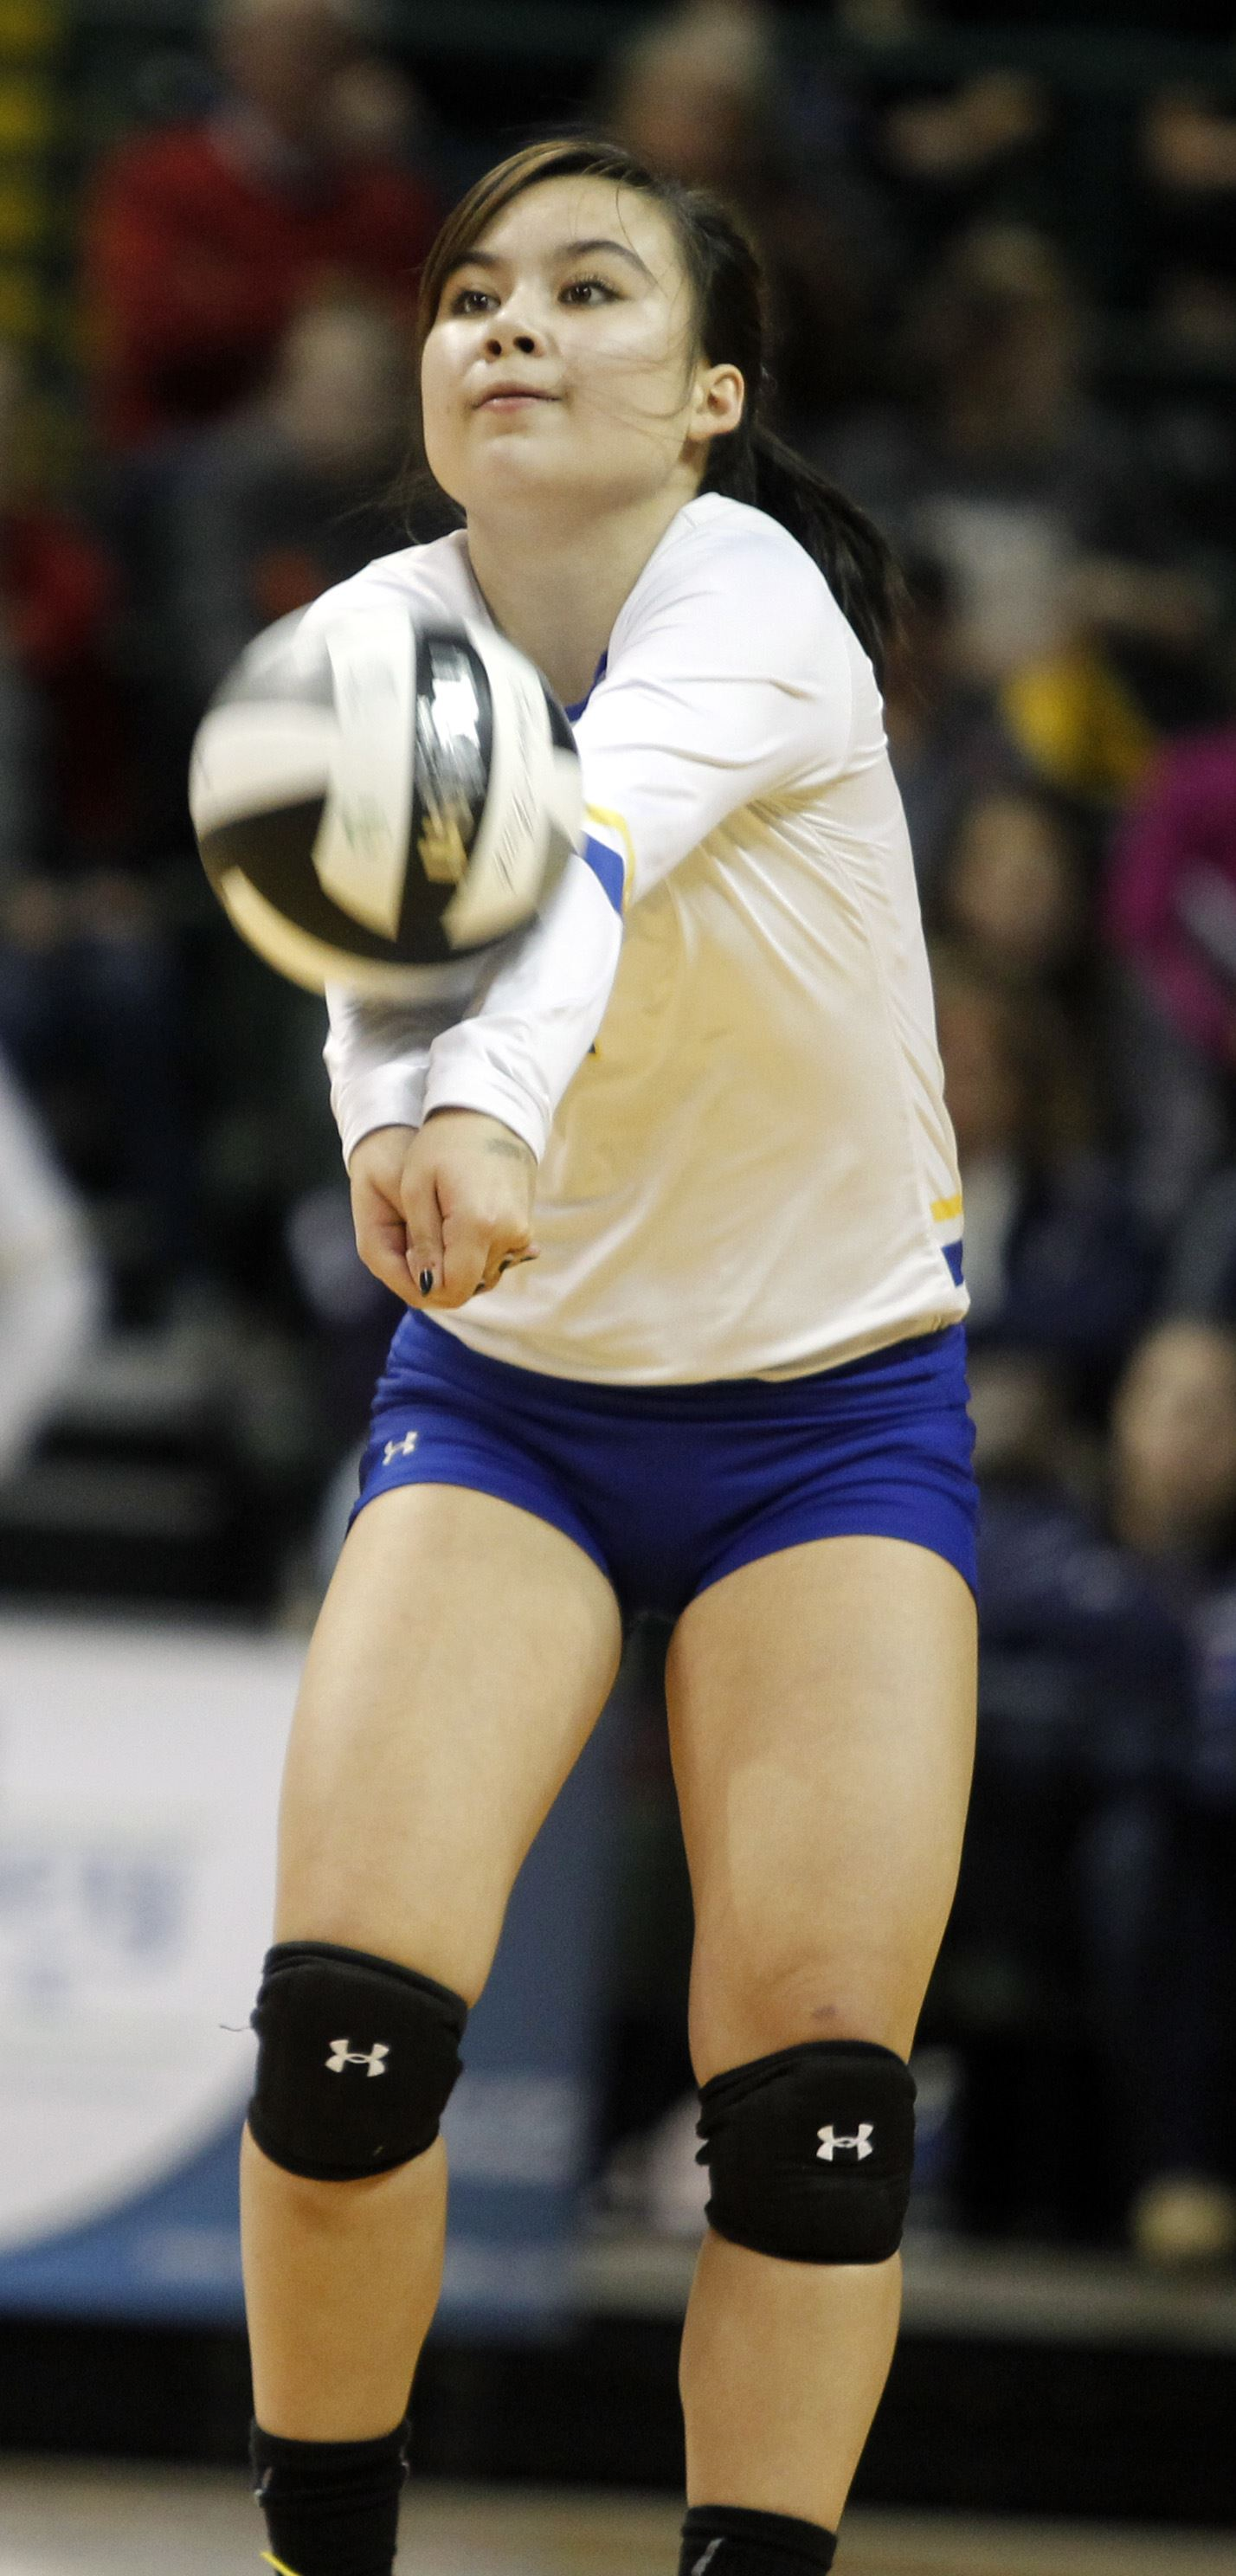 Catch It Kansas Volleyball Eedbc D A Bab Ababda